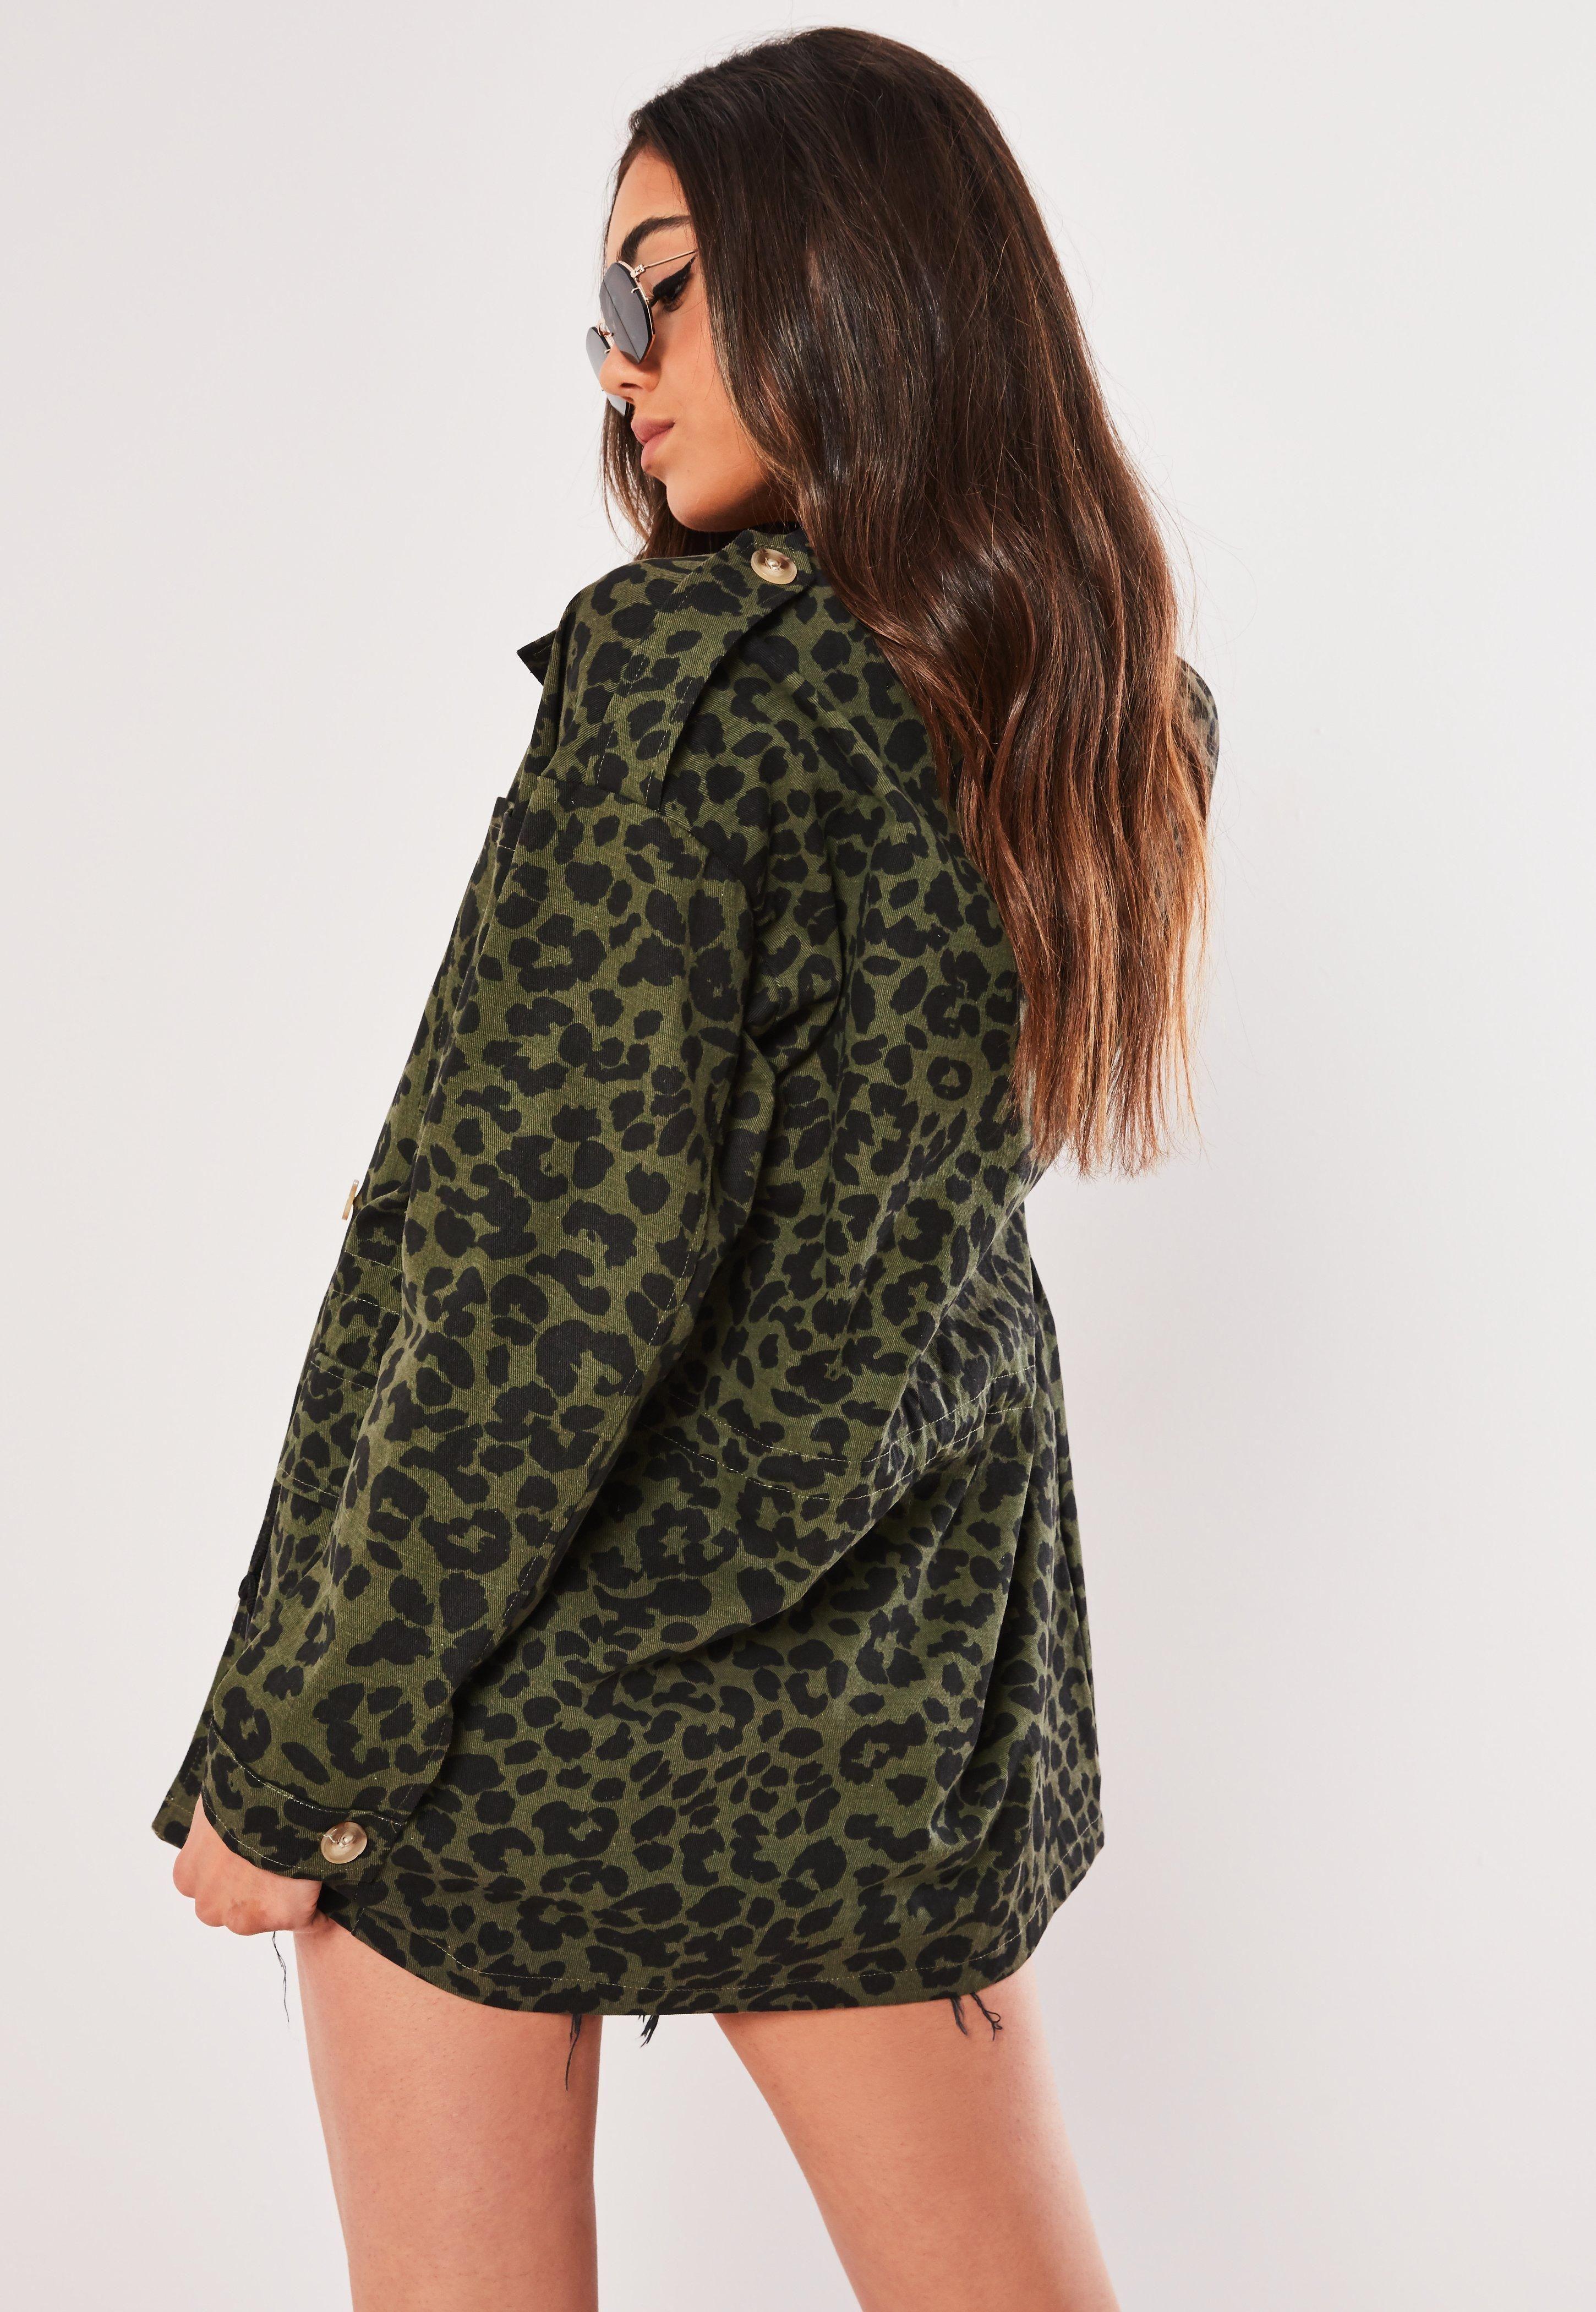 1b3cb56eb Petite Khaki Leopard Print Camo Parka Jacket  Sponsored  Leopard